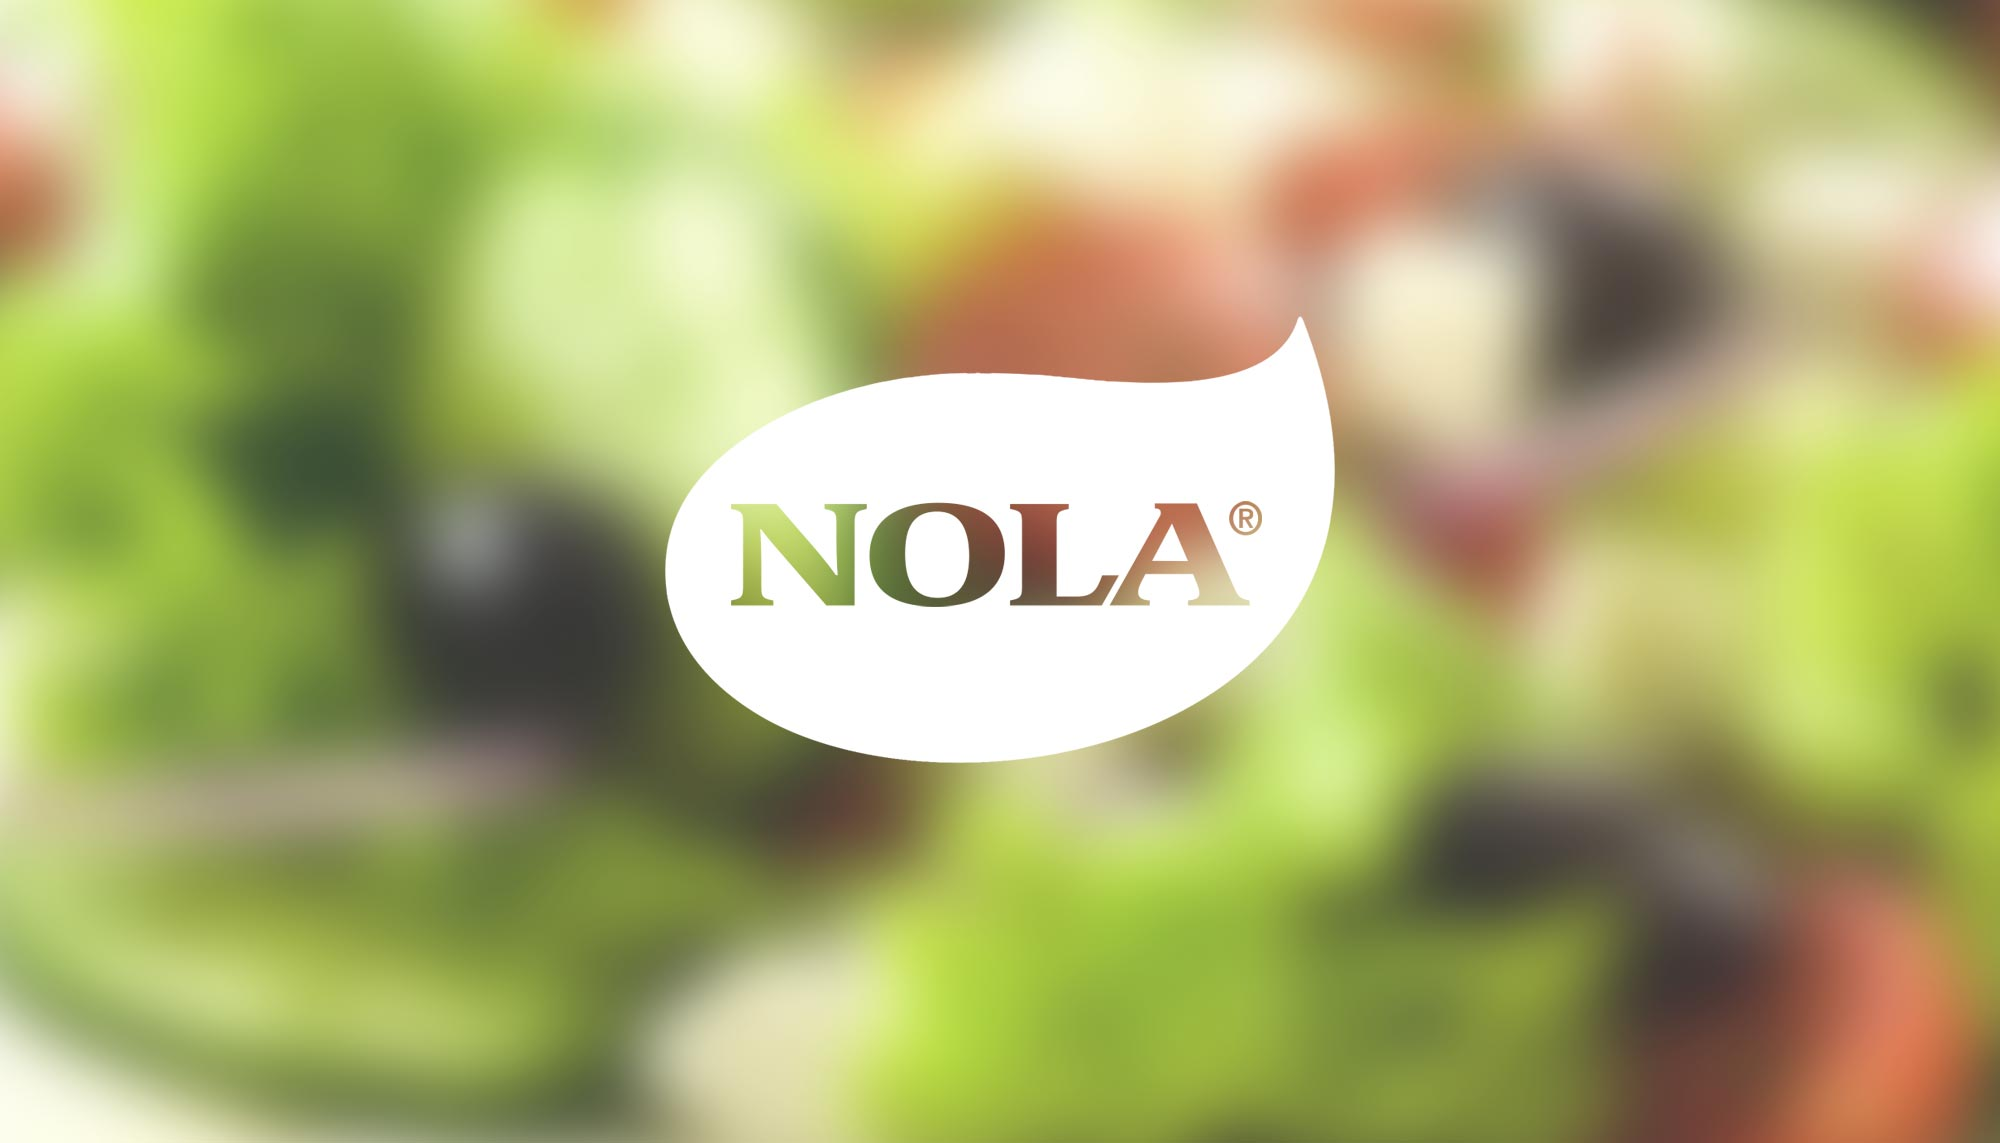 White Nola Logo on blurry salad background